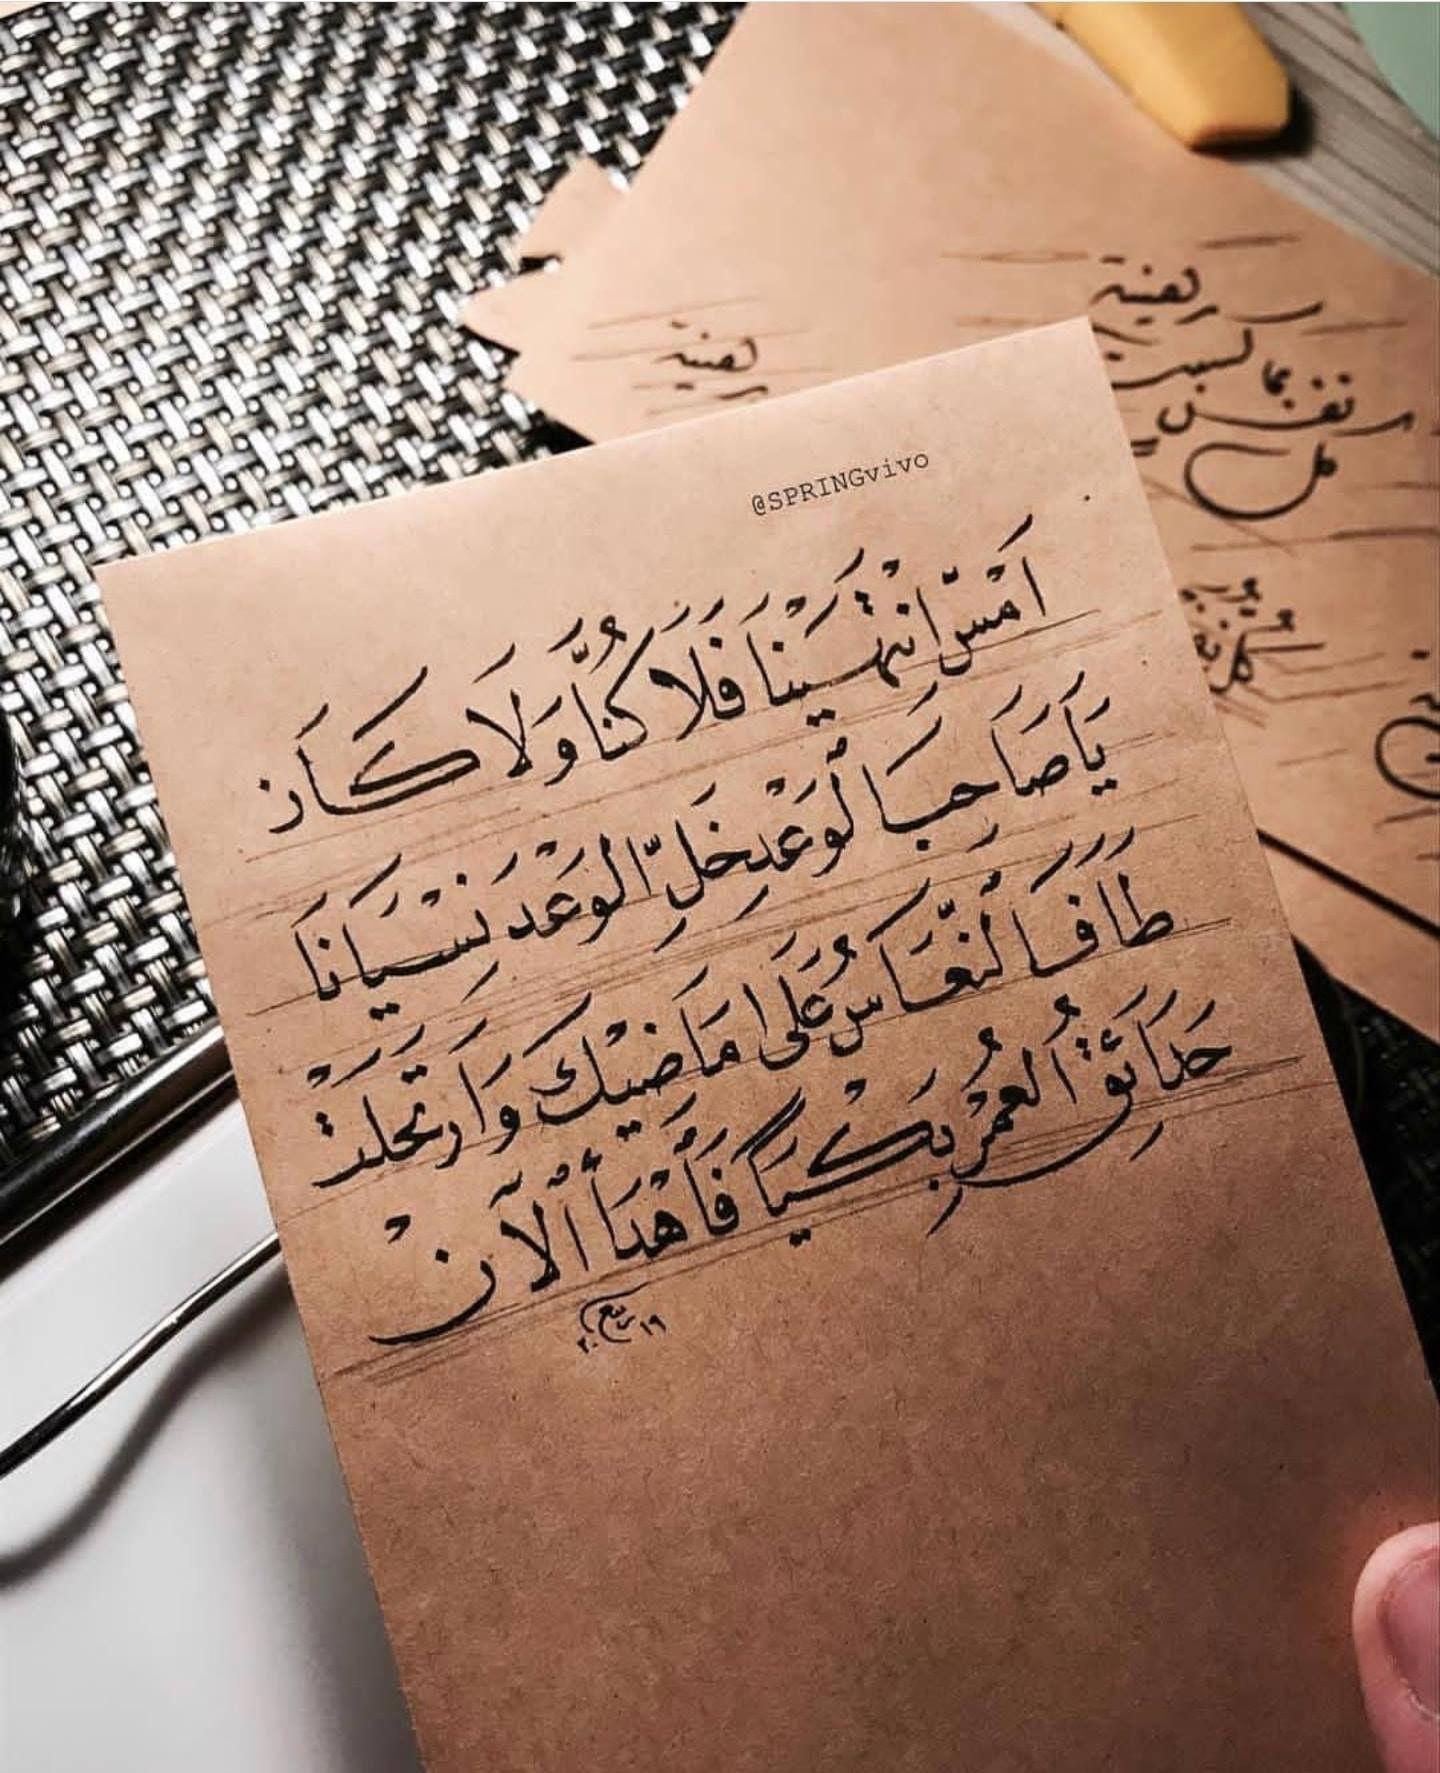 Pin By Farah On Arabic Poetry Arabic Poetry Writing Arabic